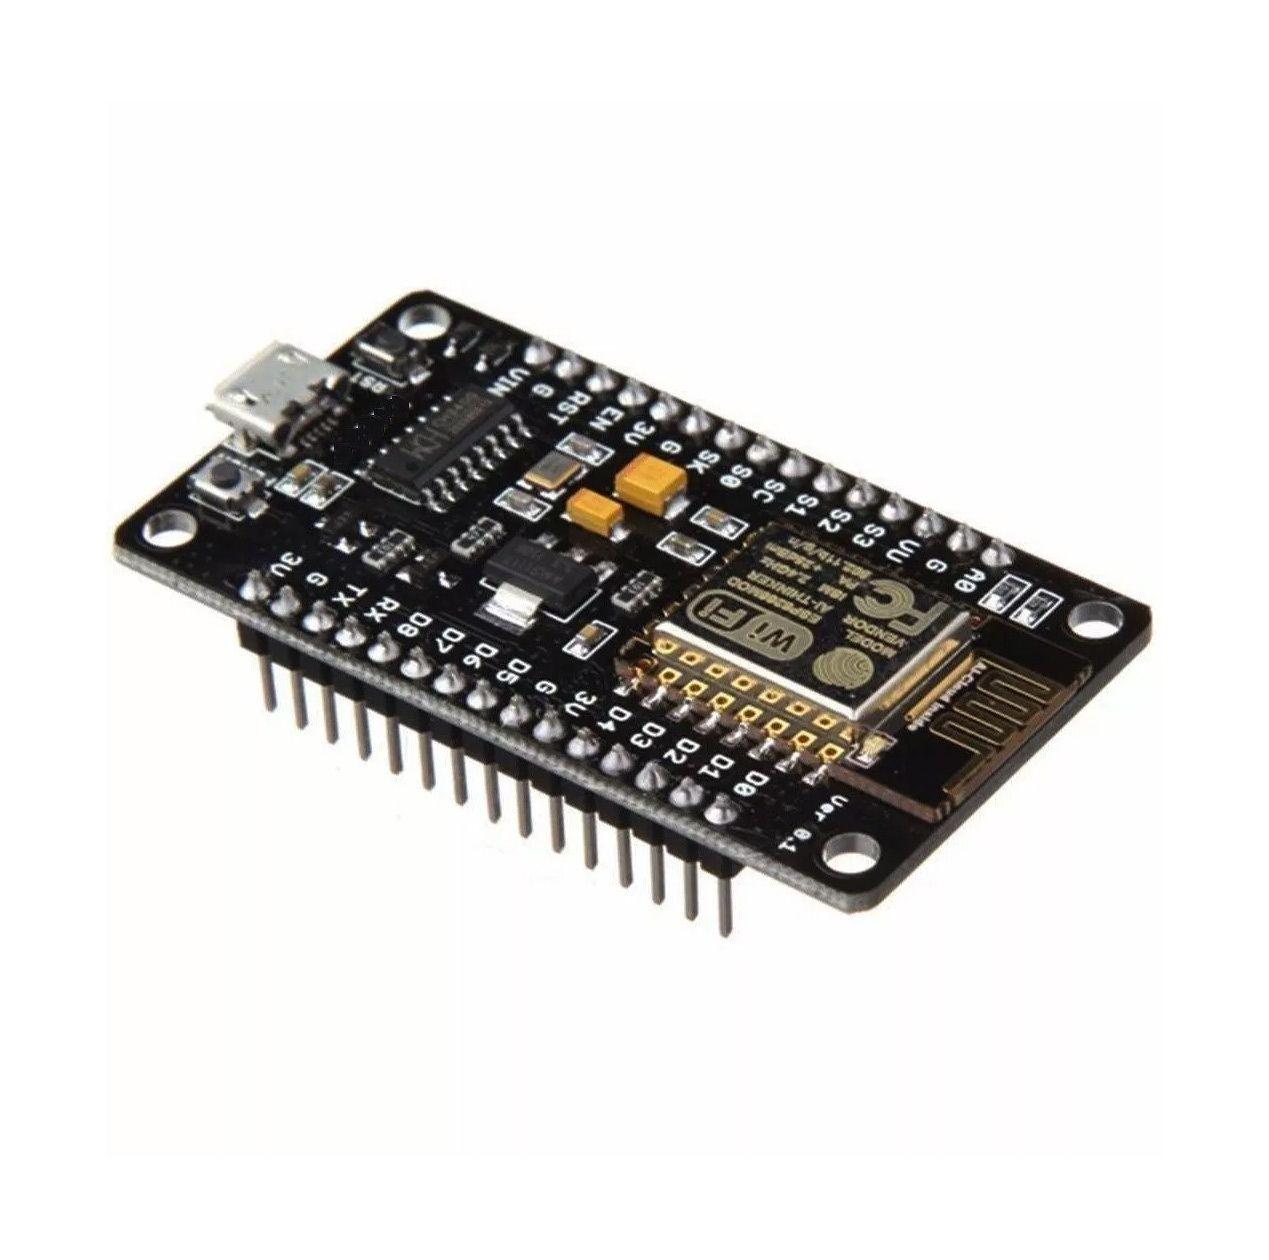 5x Placa ESP-12 Nodemcu V3 Wifi 802.11 B/g/n Esp8266 Esp 12